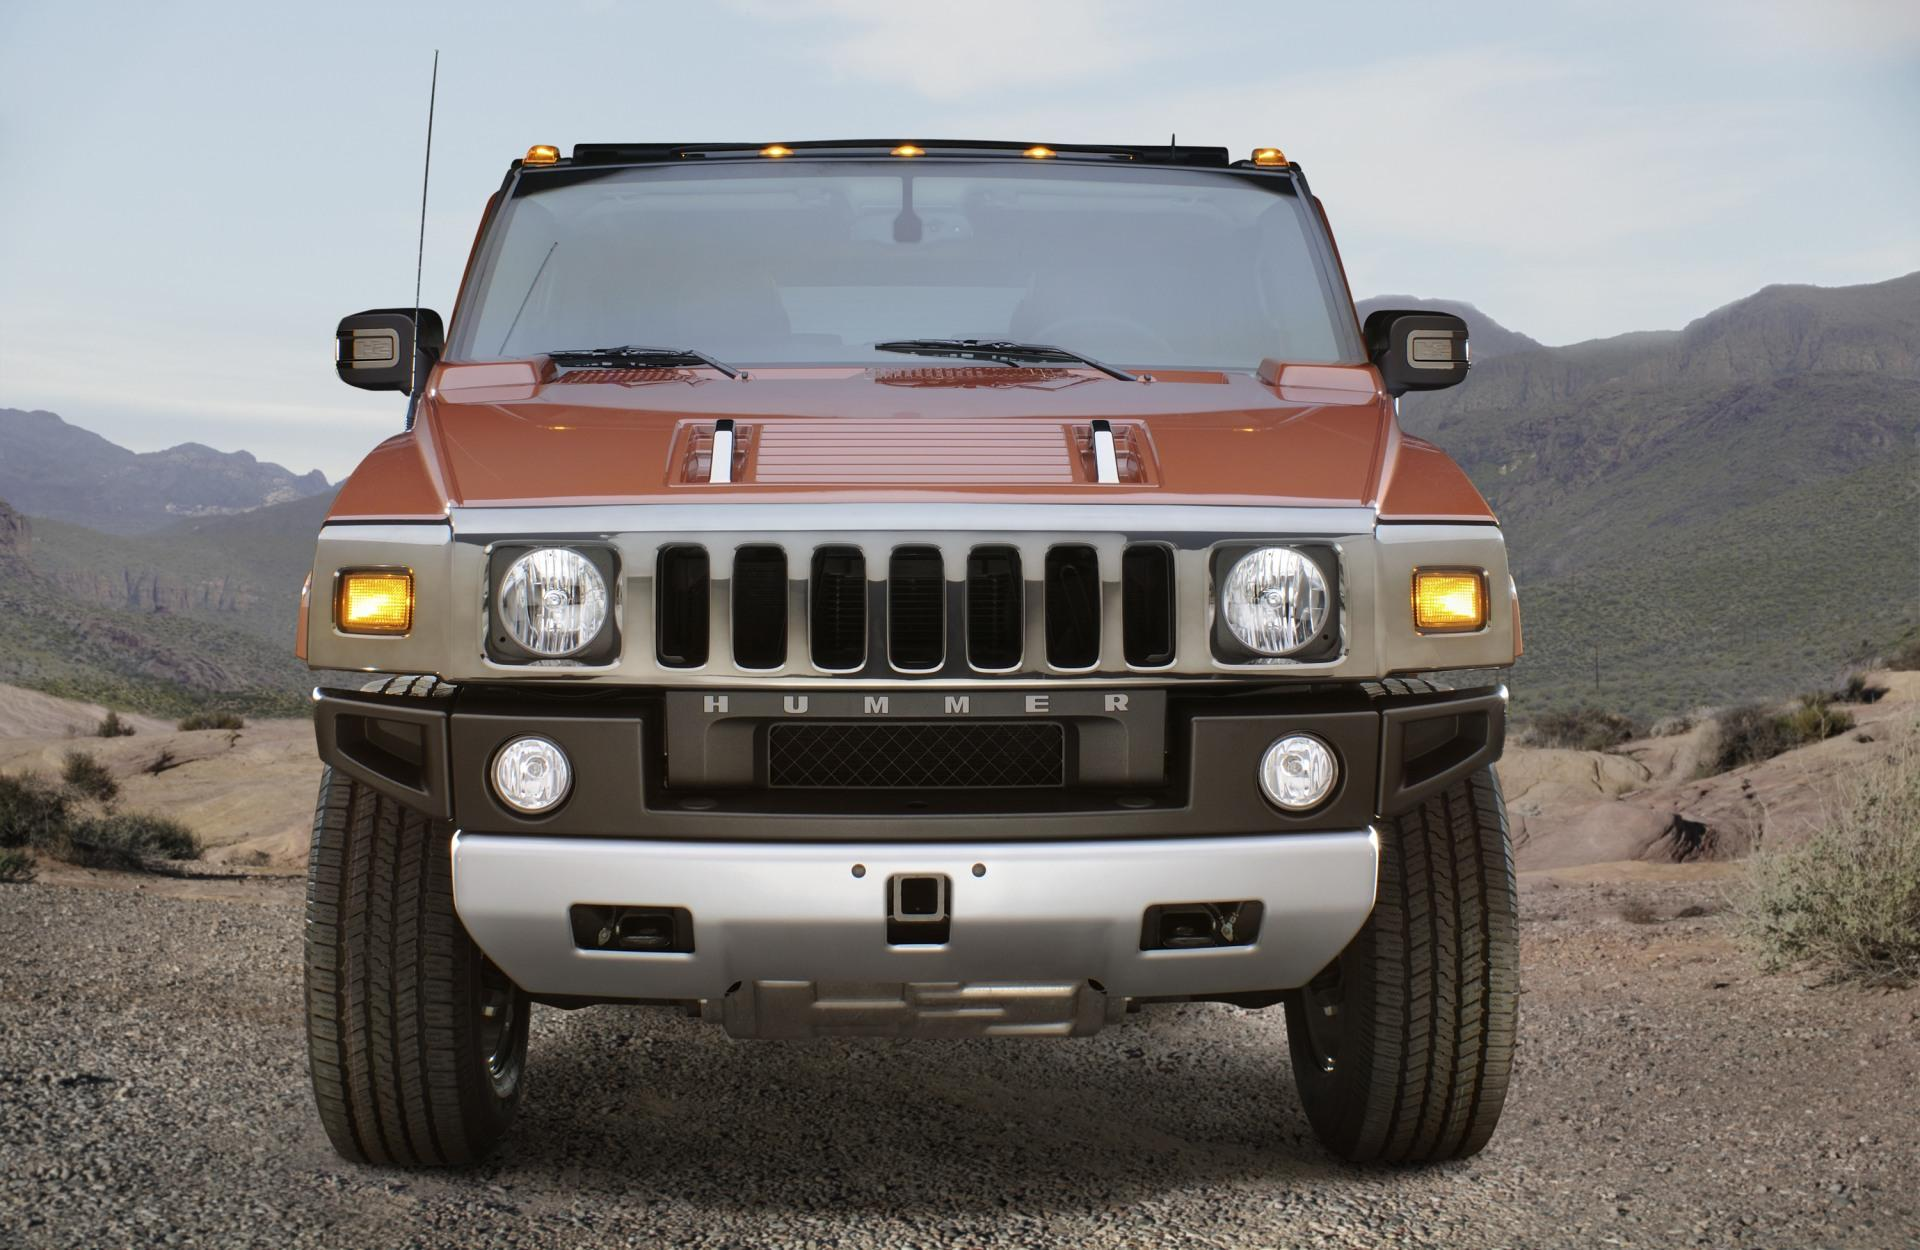 2010 Hummer H2 conceptcarz